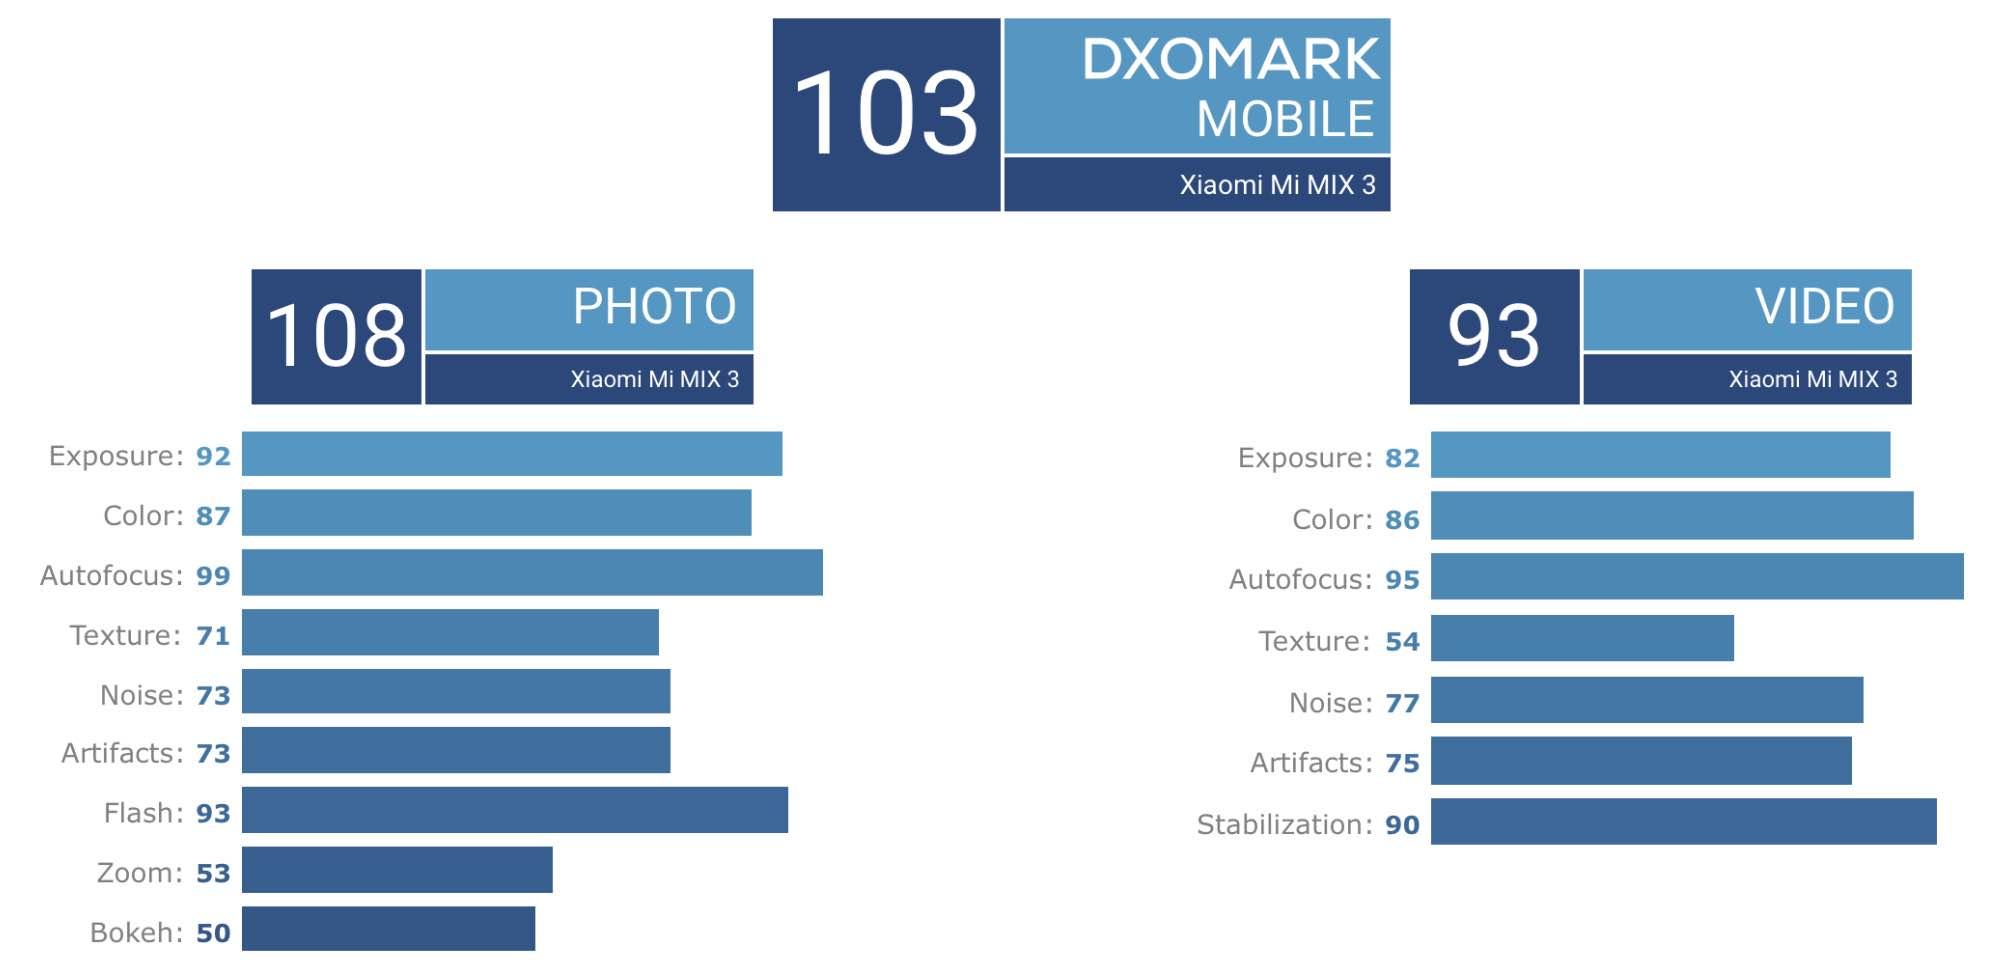 Xiaomi Mi Mix 3 - DxOMark